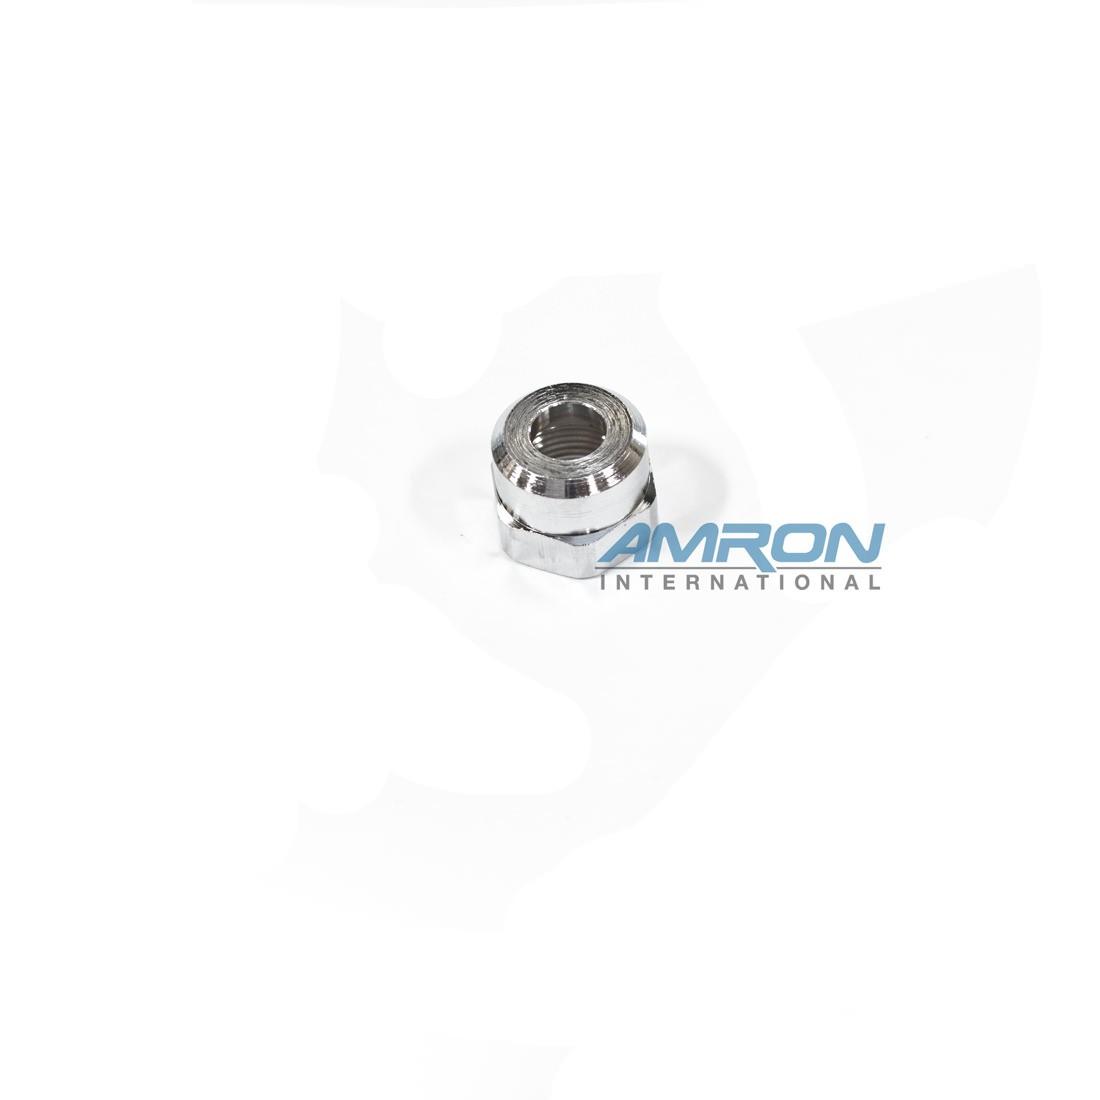 Kirby Morgan 550-091 Packing Nut